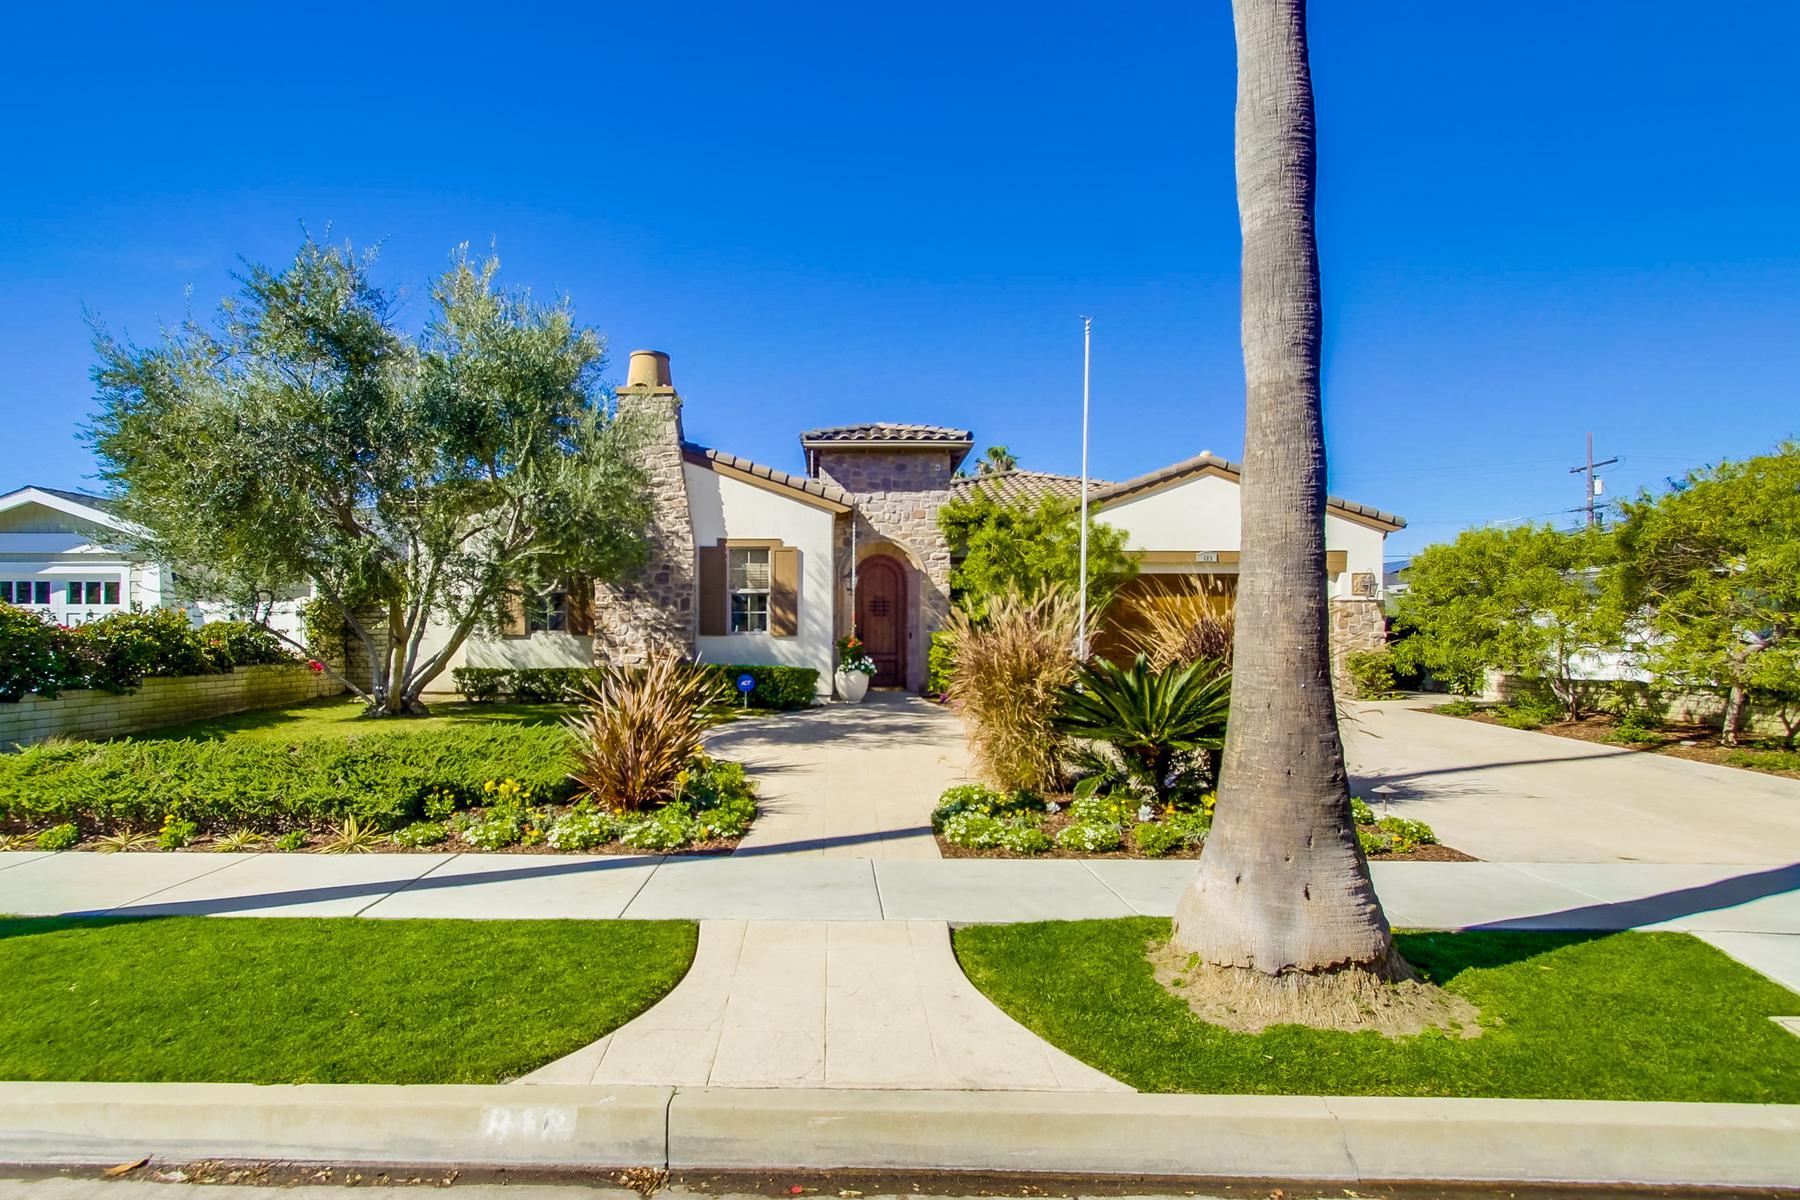 Additional photo for property listing at 810 Alameda Blvd 810 Alameda Blvd Coronado, California 92118 United States